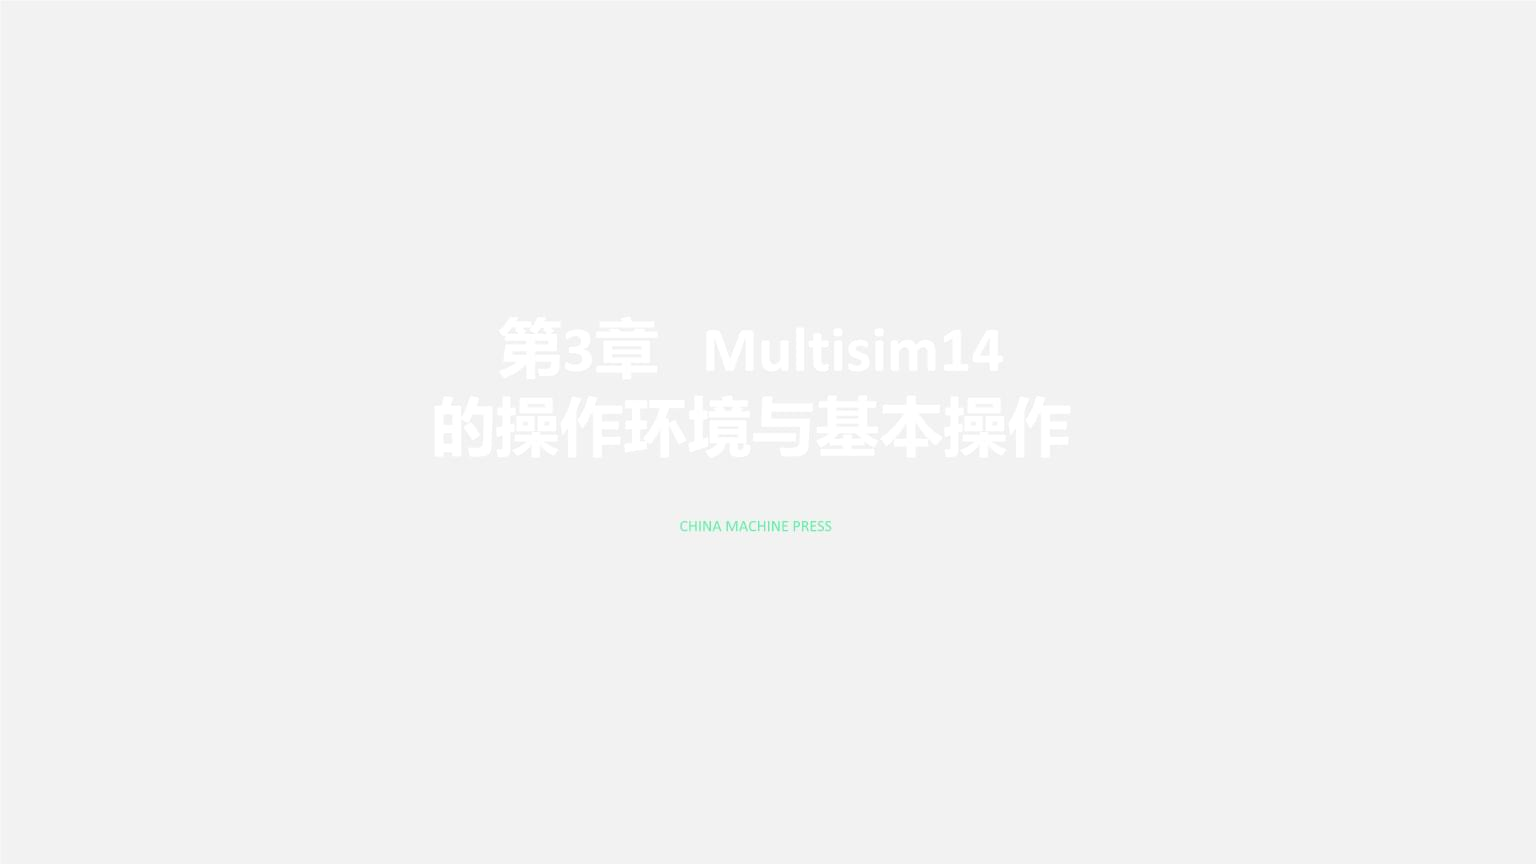 Multisim14电子系统仿真与设计第3章 Multisim14的操作环境与基本操作.ppt